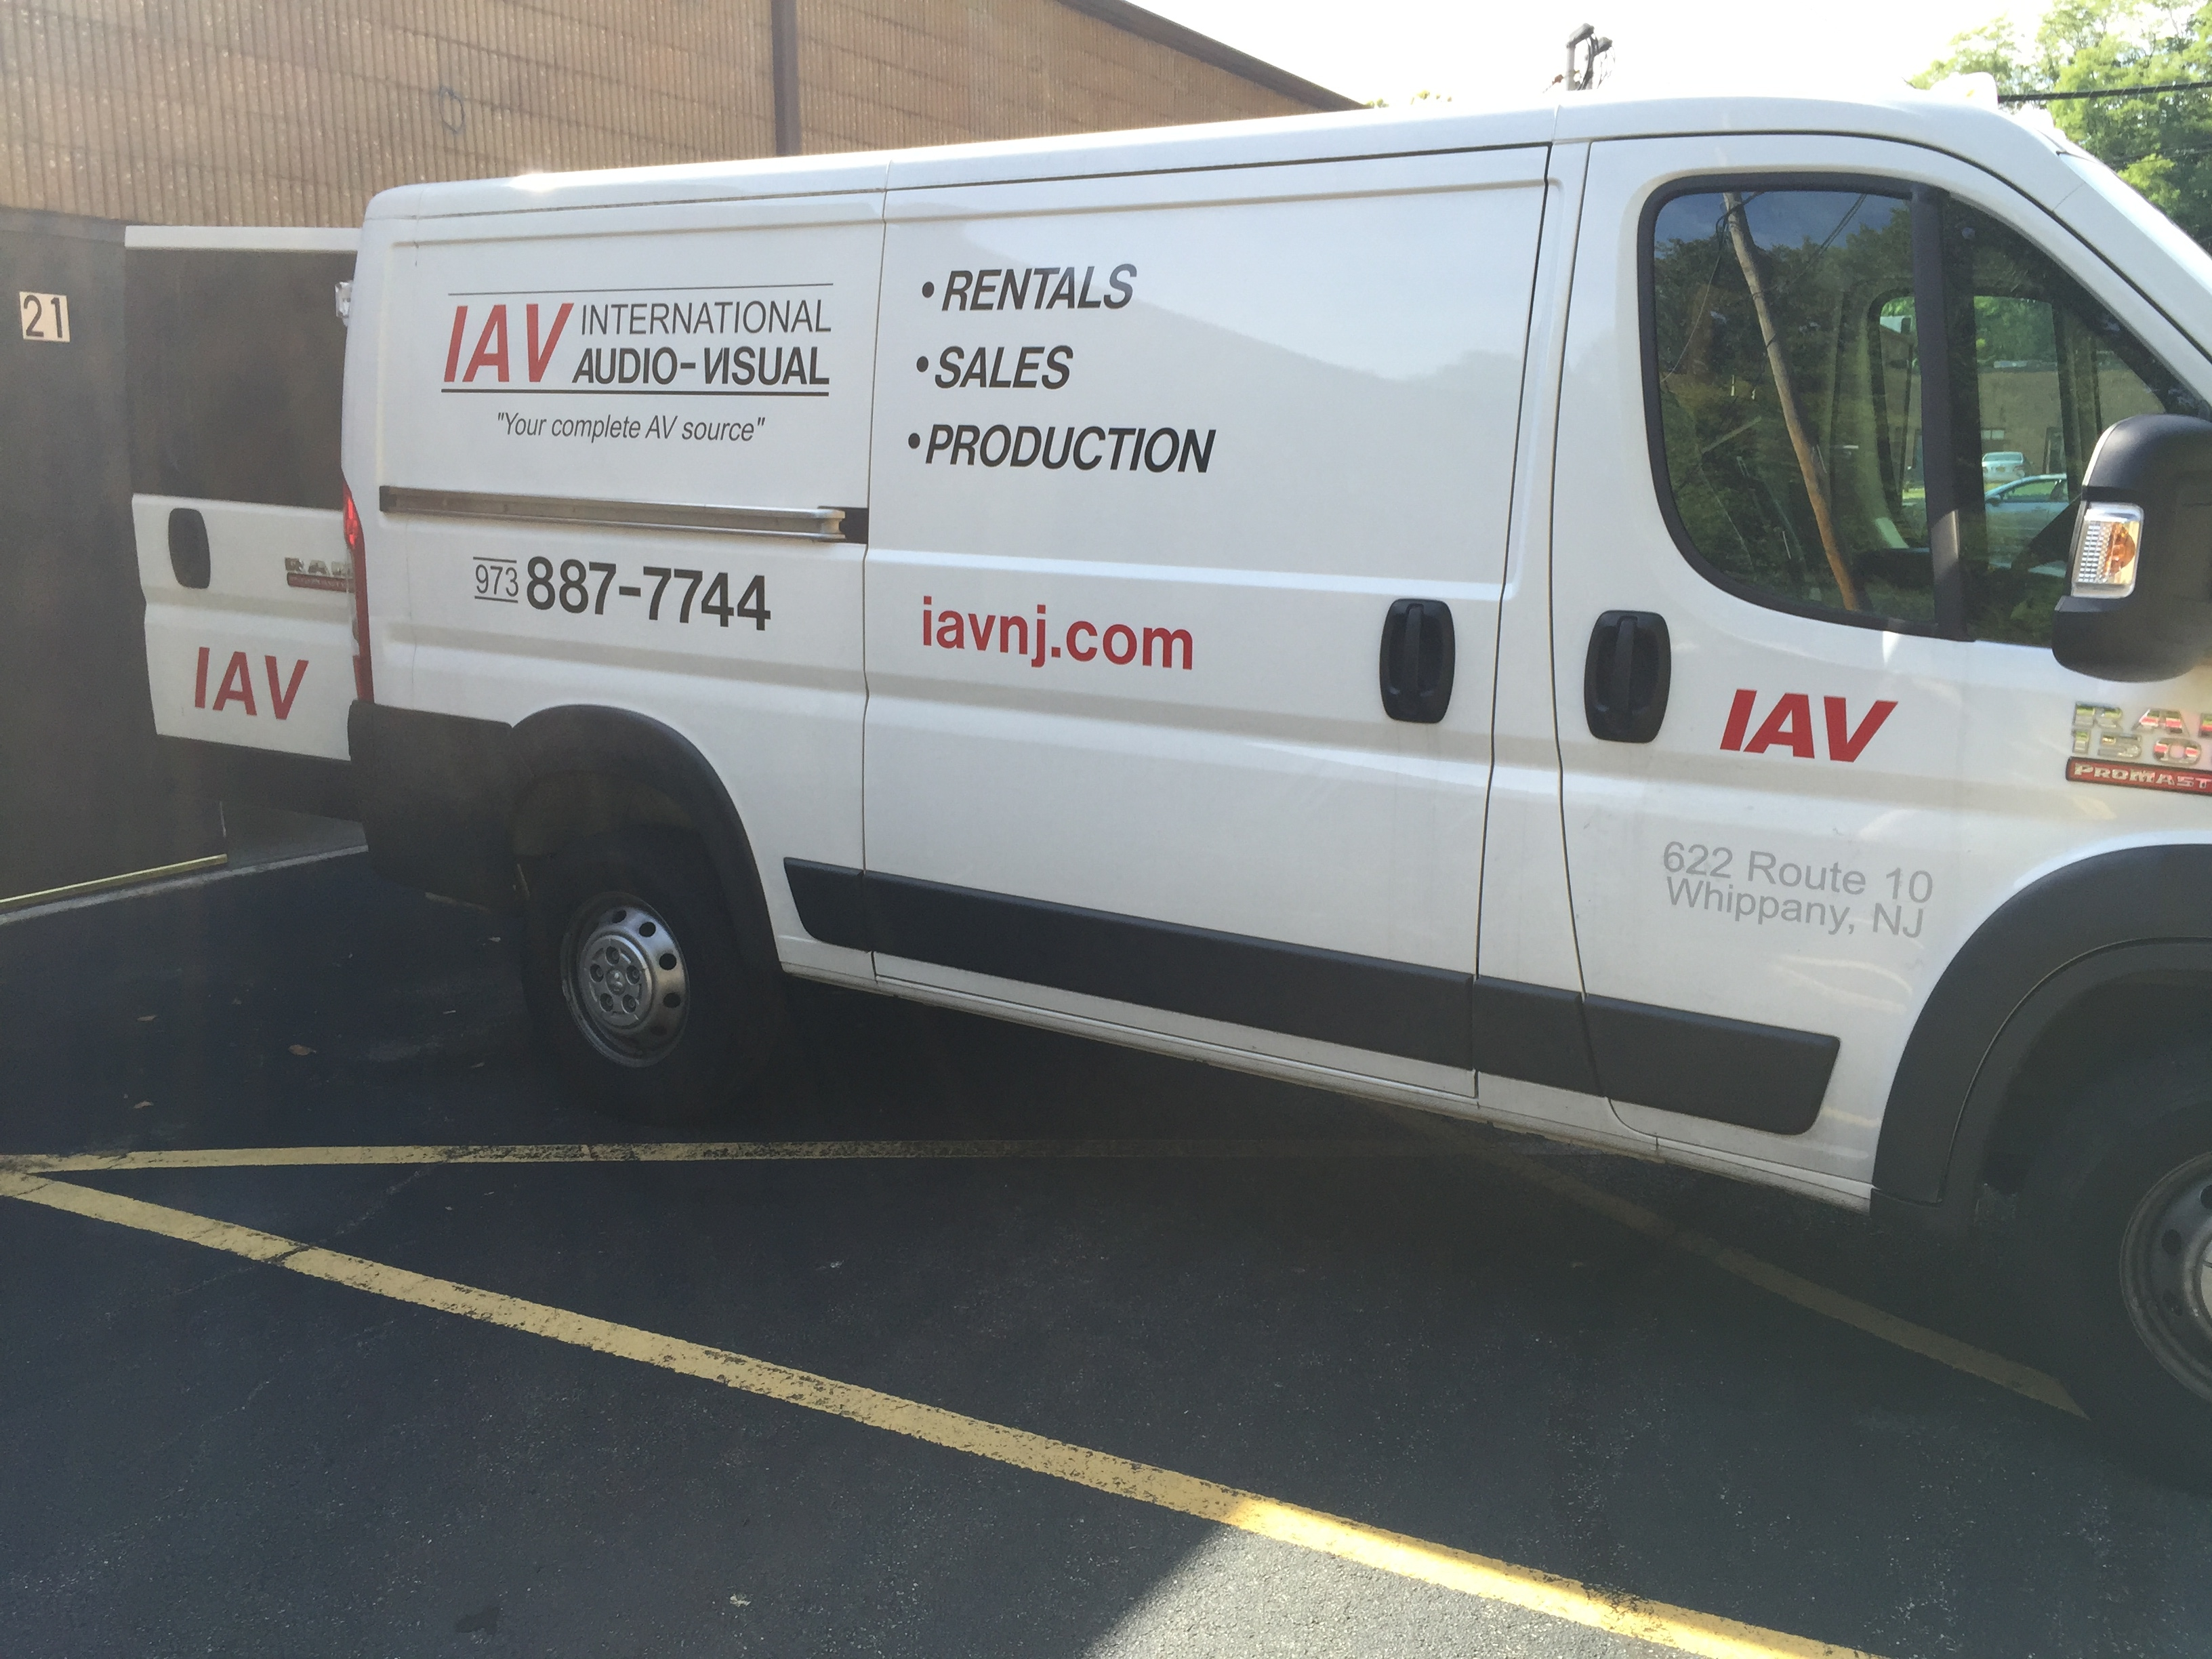 IAV – International Audio Visual